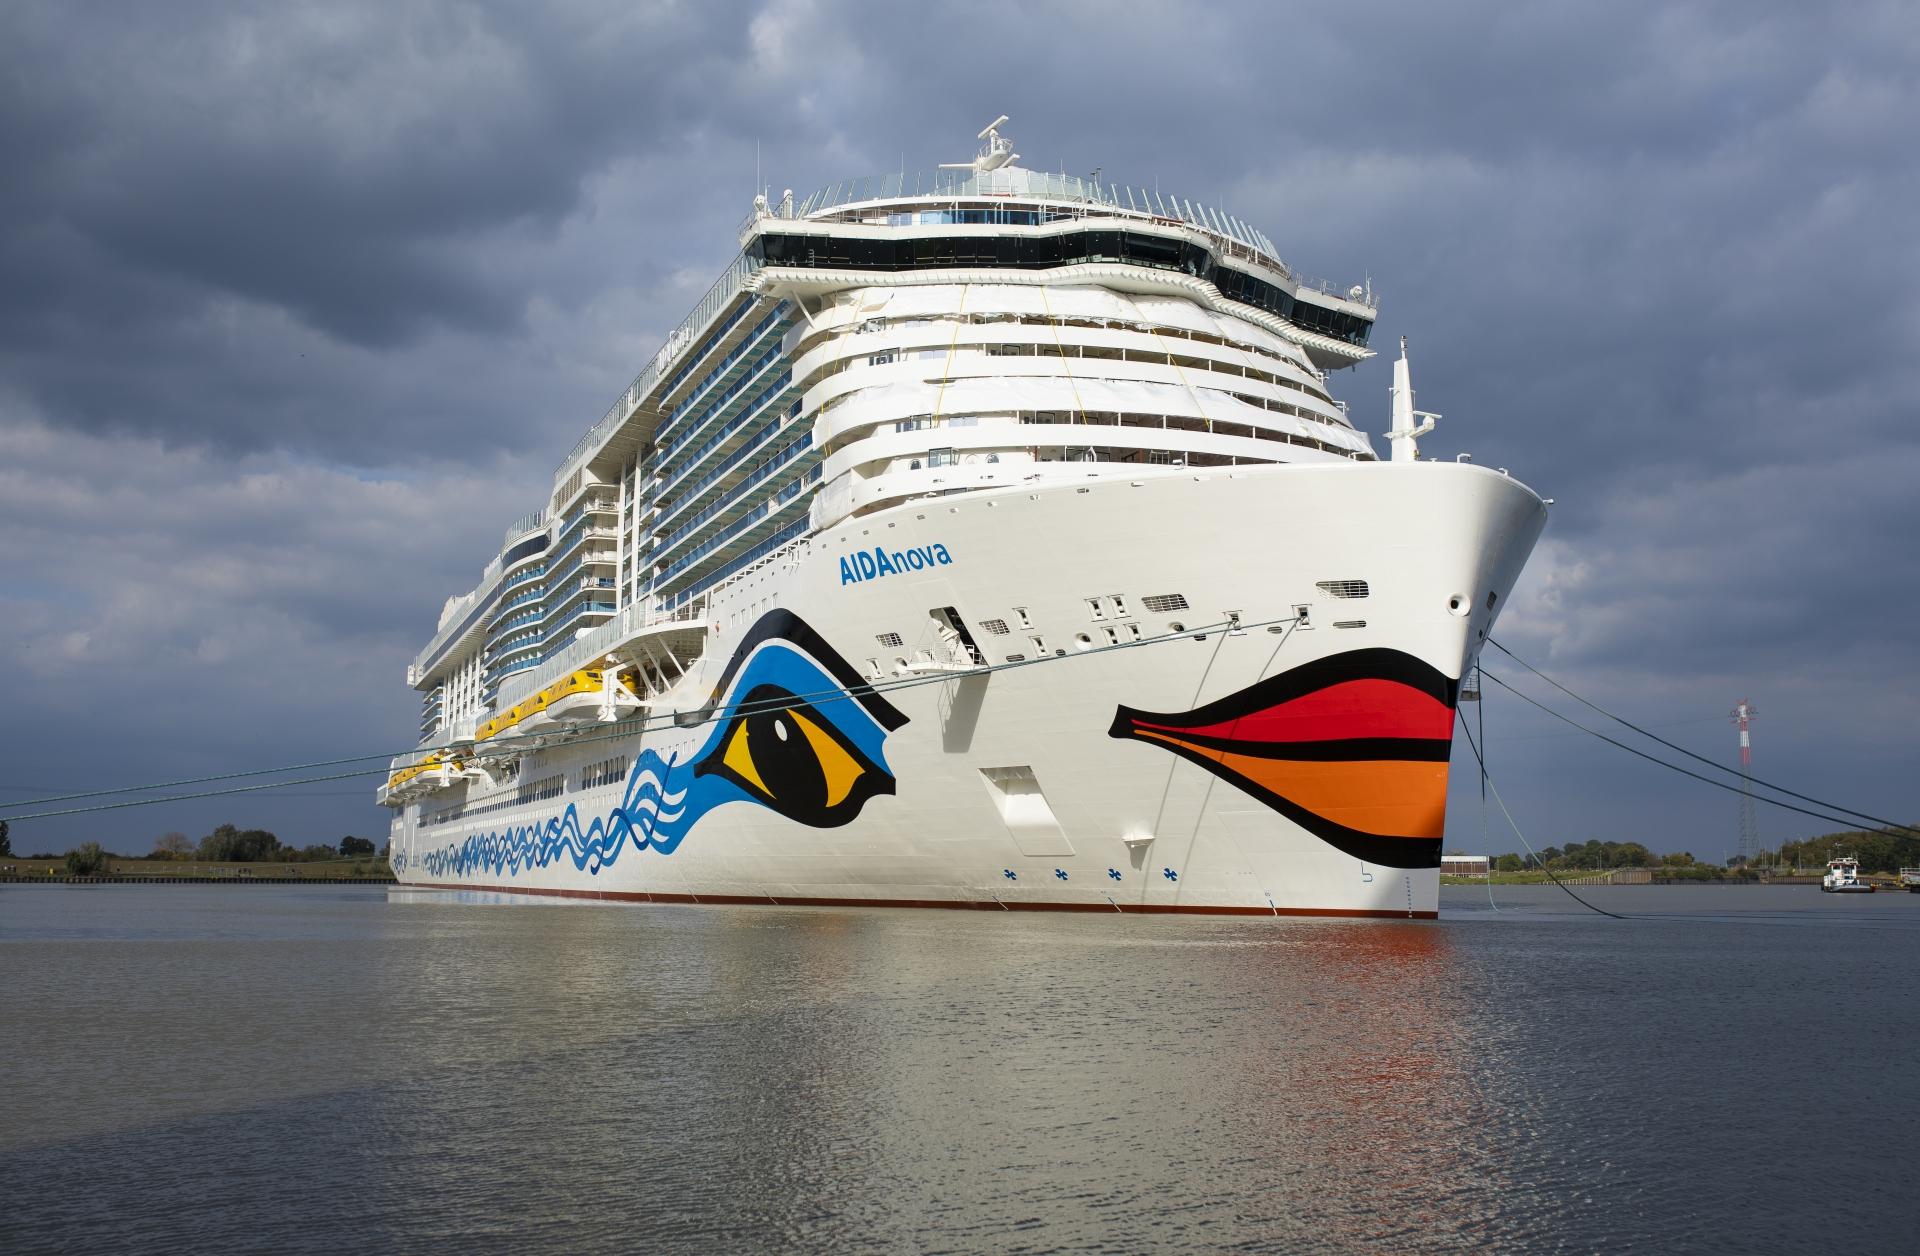 Schiffsreisenportal-Kreuzfahrten-Schiffsreisen-Weltreisen_AIDA-AIDAnova-Kreuzfahrt-Bild1